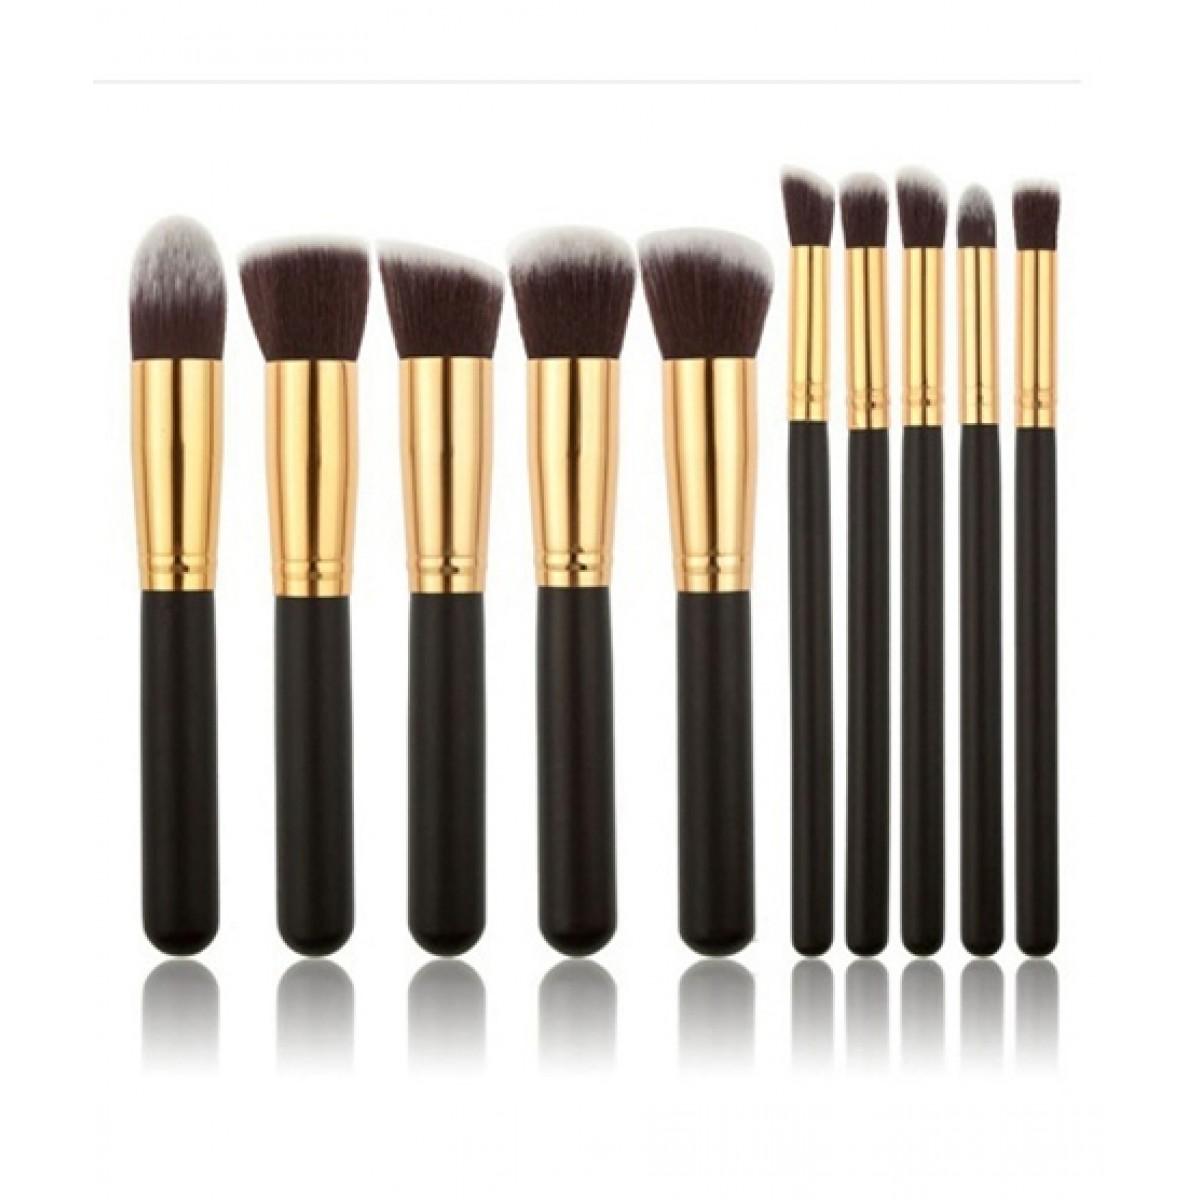 Pack of 10 Makeup Brushes Set Beautiful & Soft Hair for Ladies & Girls Make up Brushes Tool 10 Pcs